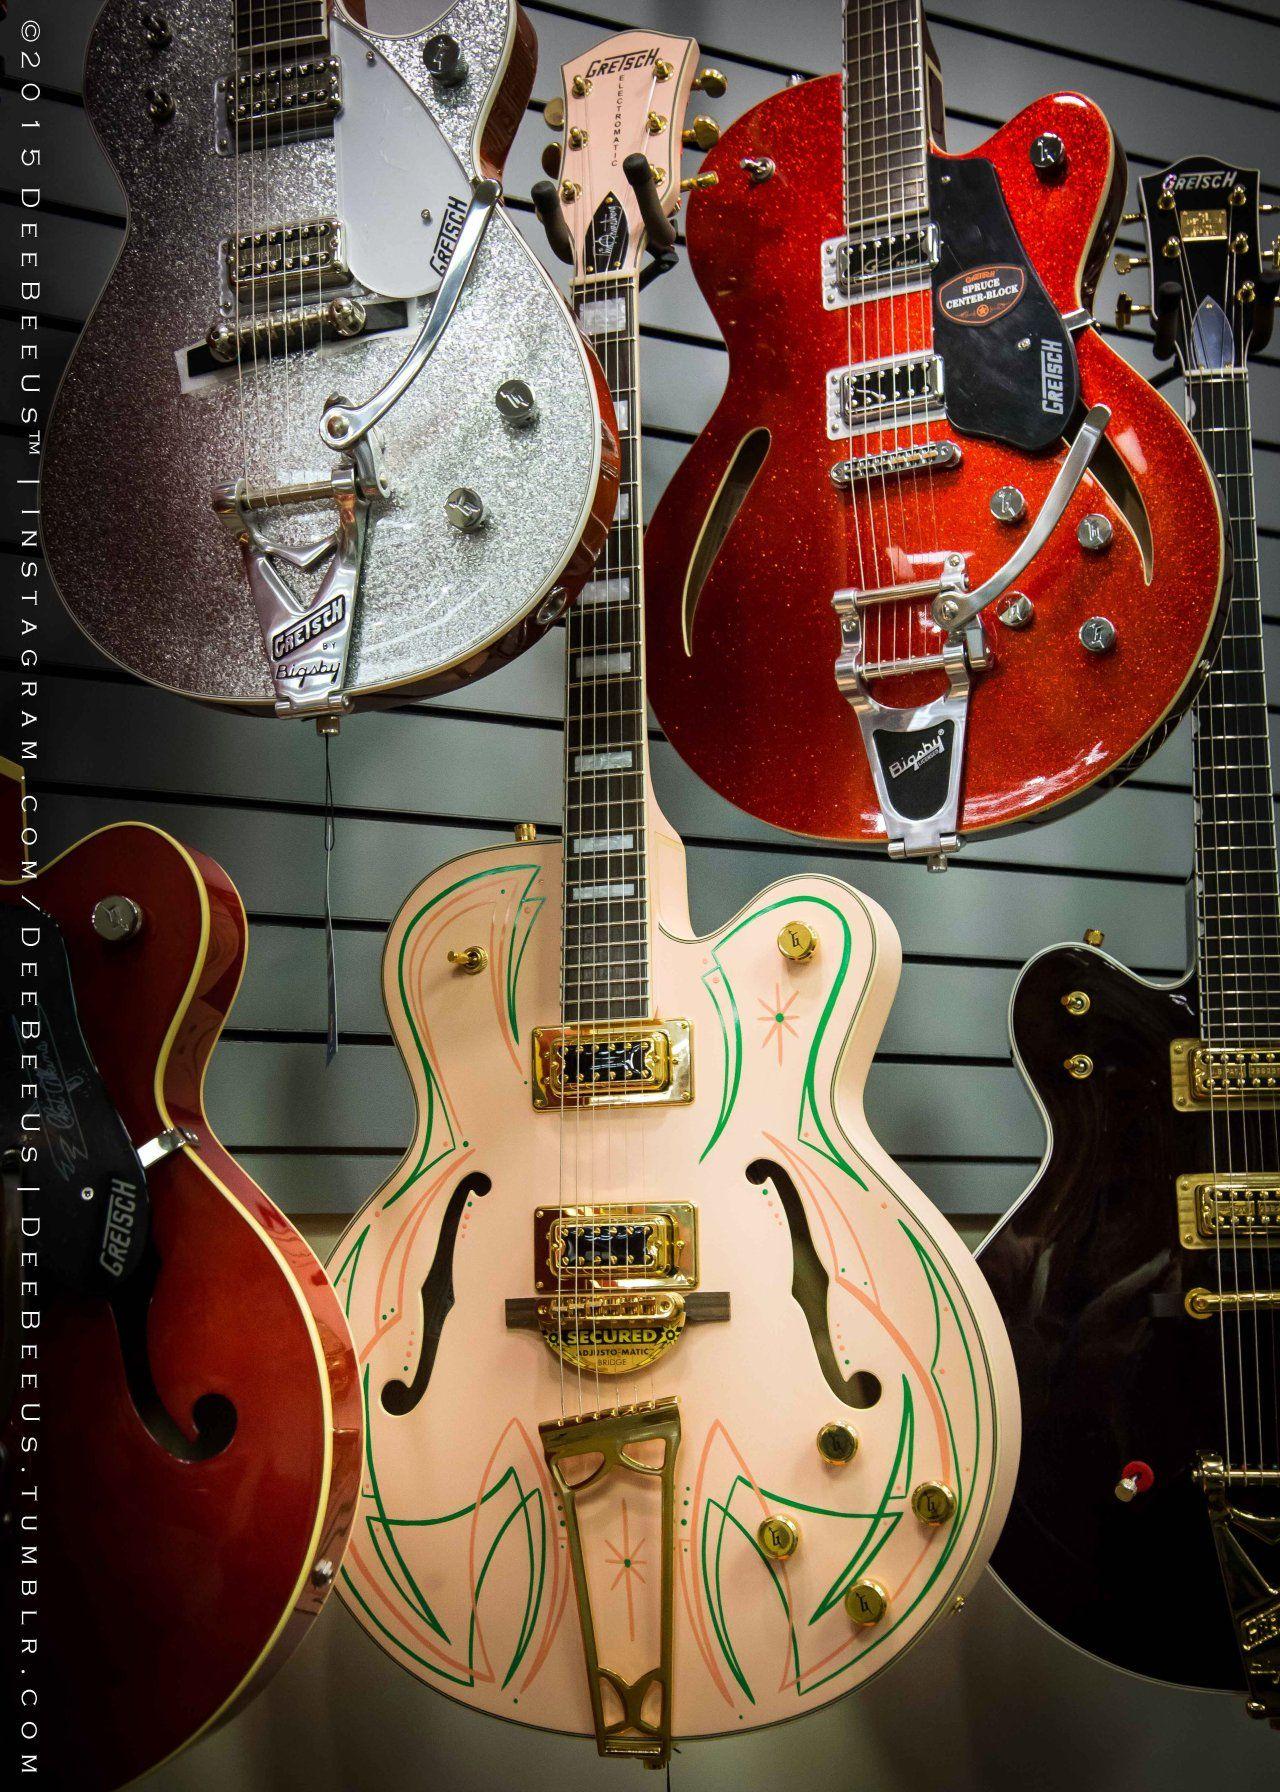 Deebeeus More Guitar Shopping This Week In Toronto Canada 1 Gibson Custom Trini Lopez Signature Es 335 Reissue Guitar Fender American Vintage Guitar Shop